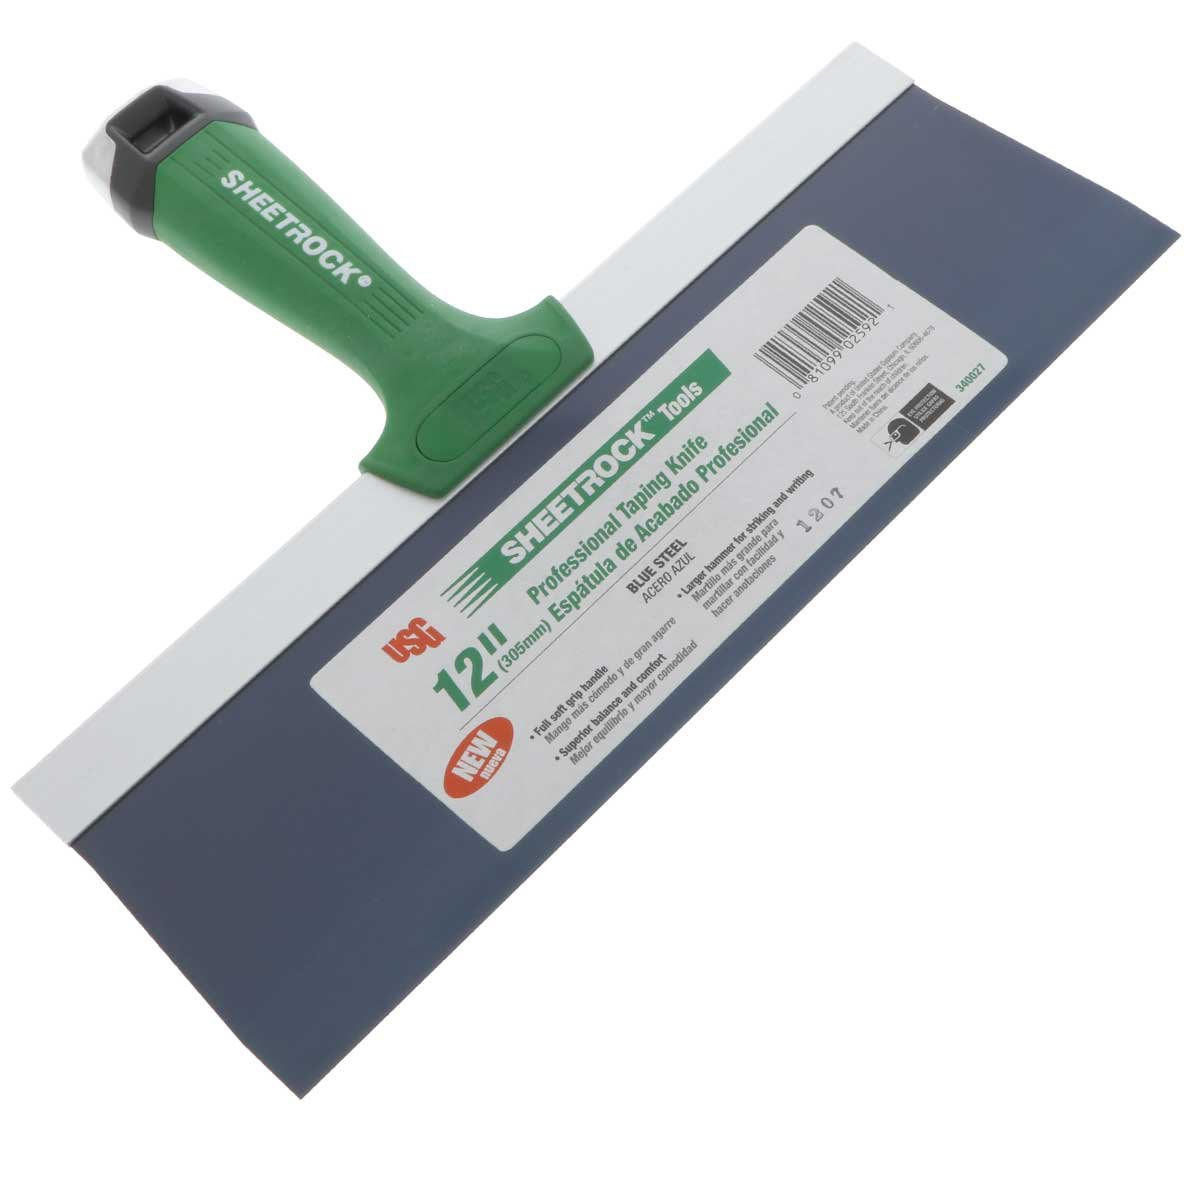 USG Sheetrock Pro Drywall Taping Knife, Blue Steel w/Soft Grip Handle & Hammer End (8-Inch Blade)